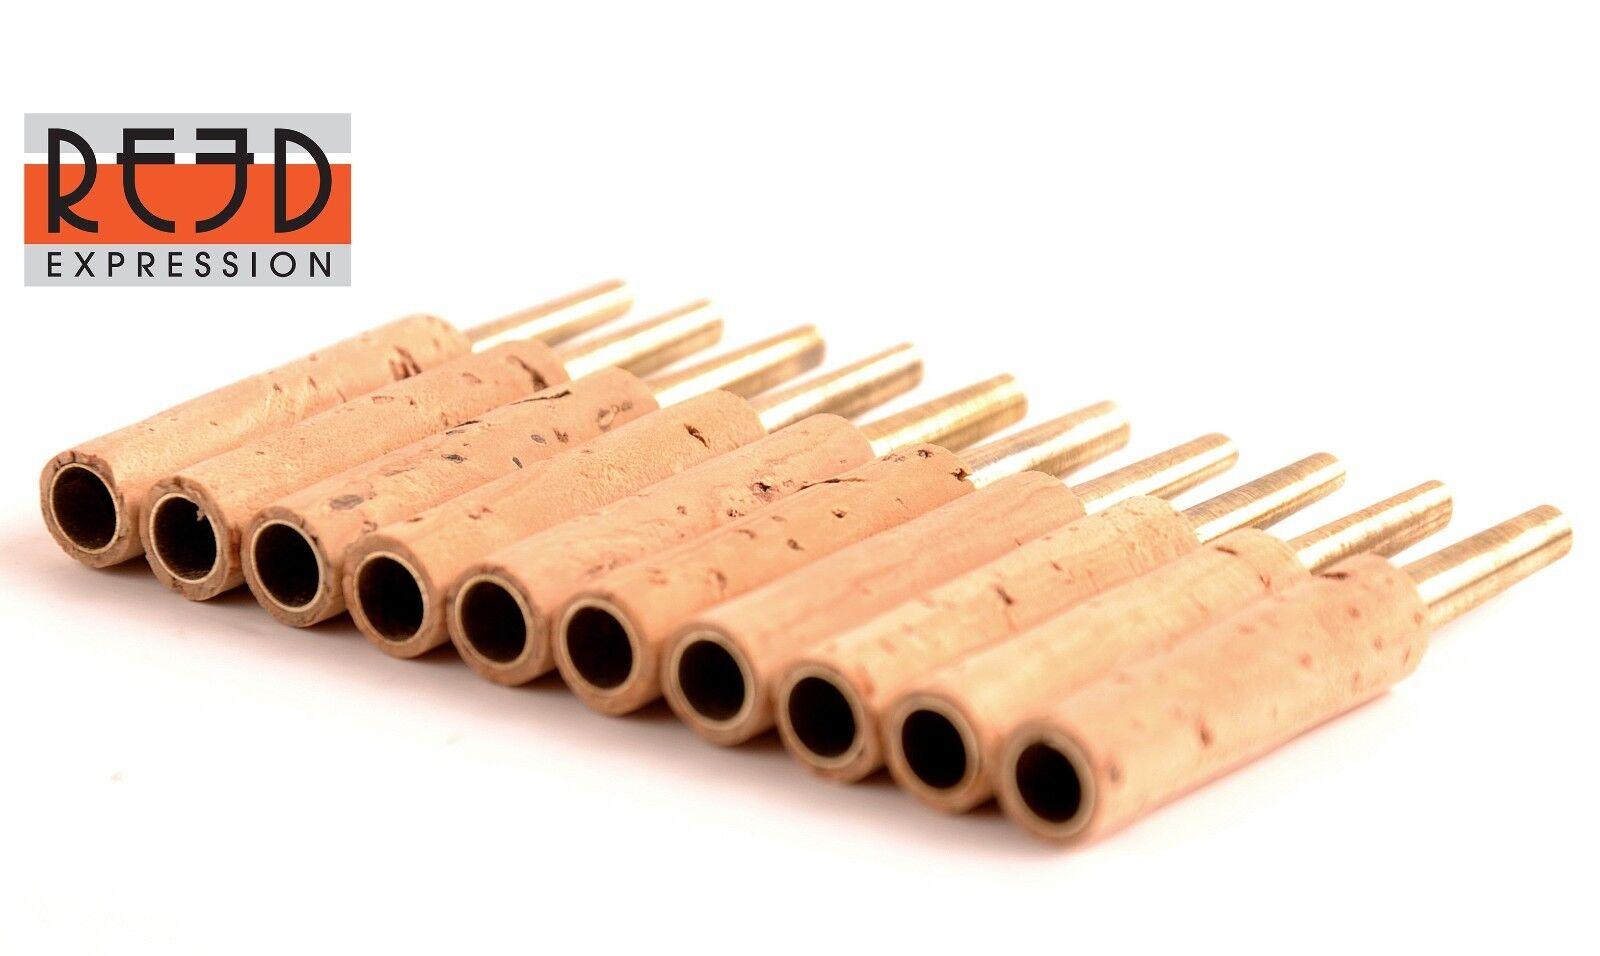 20 piezas oboe reed Grapas Grapas Grapas tubos 47 Mm-Reed expresión 4b2701